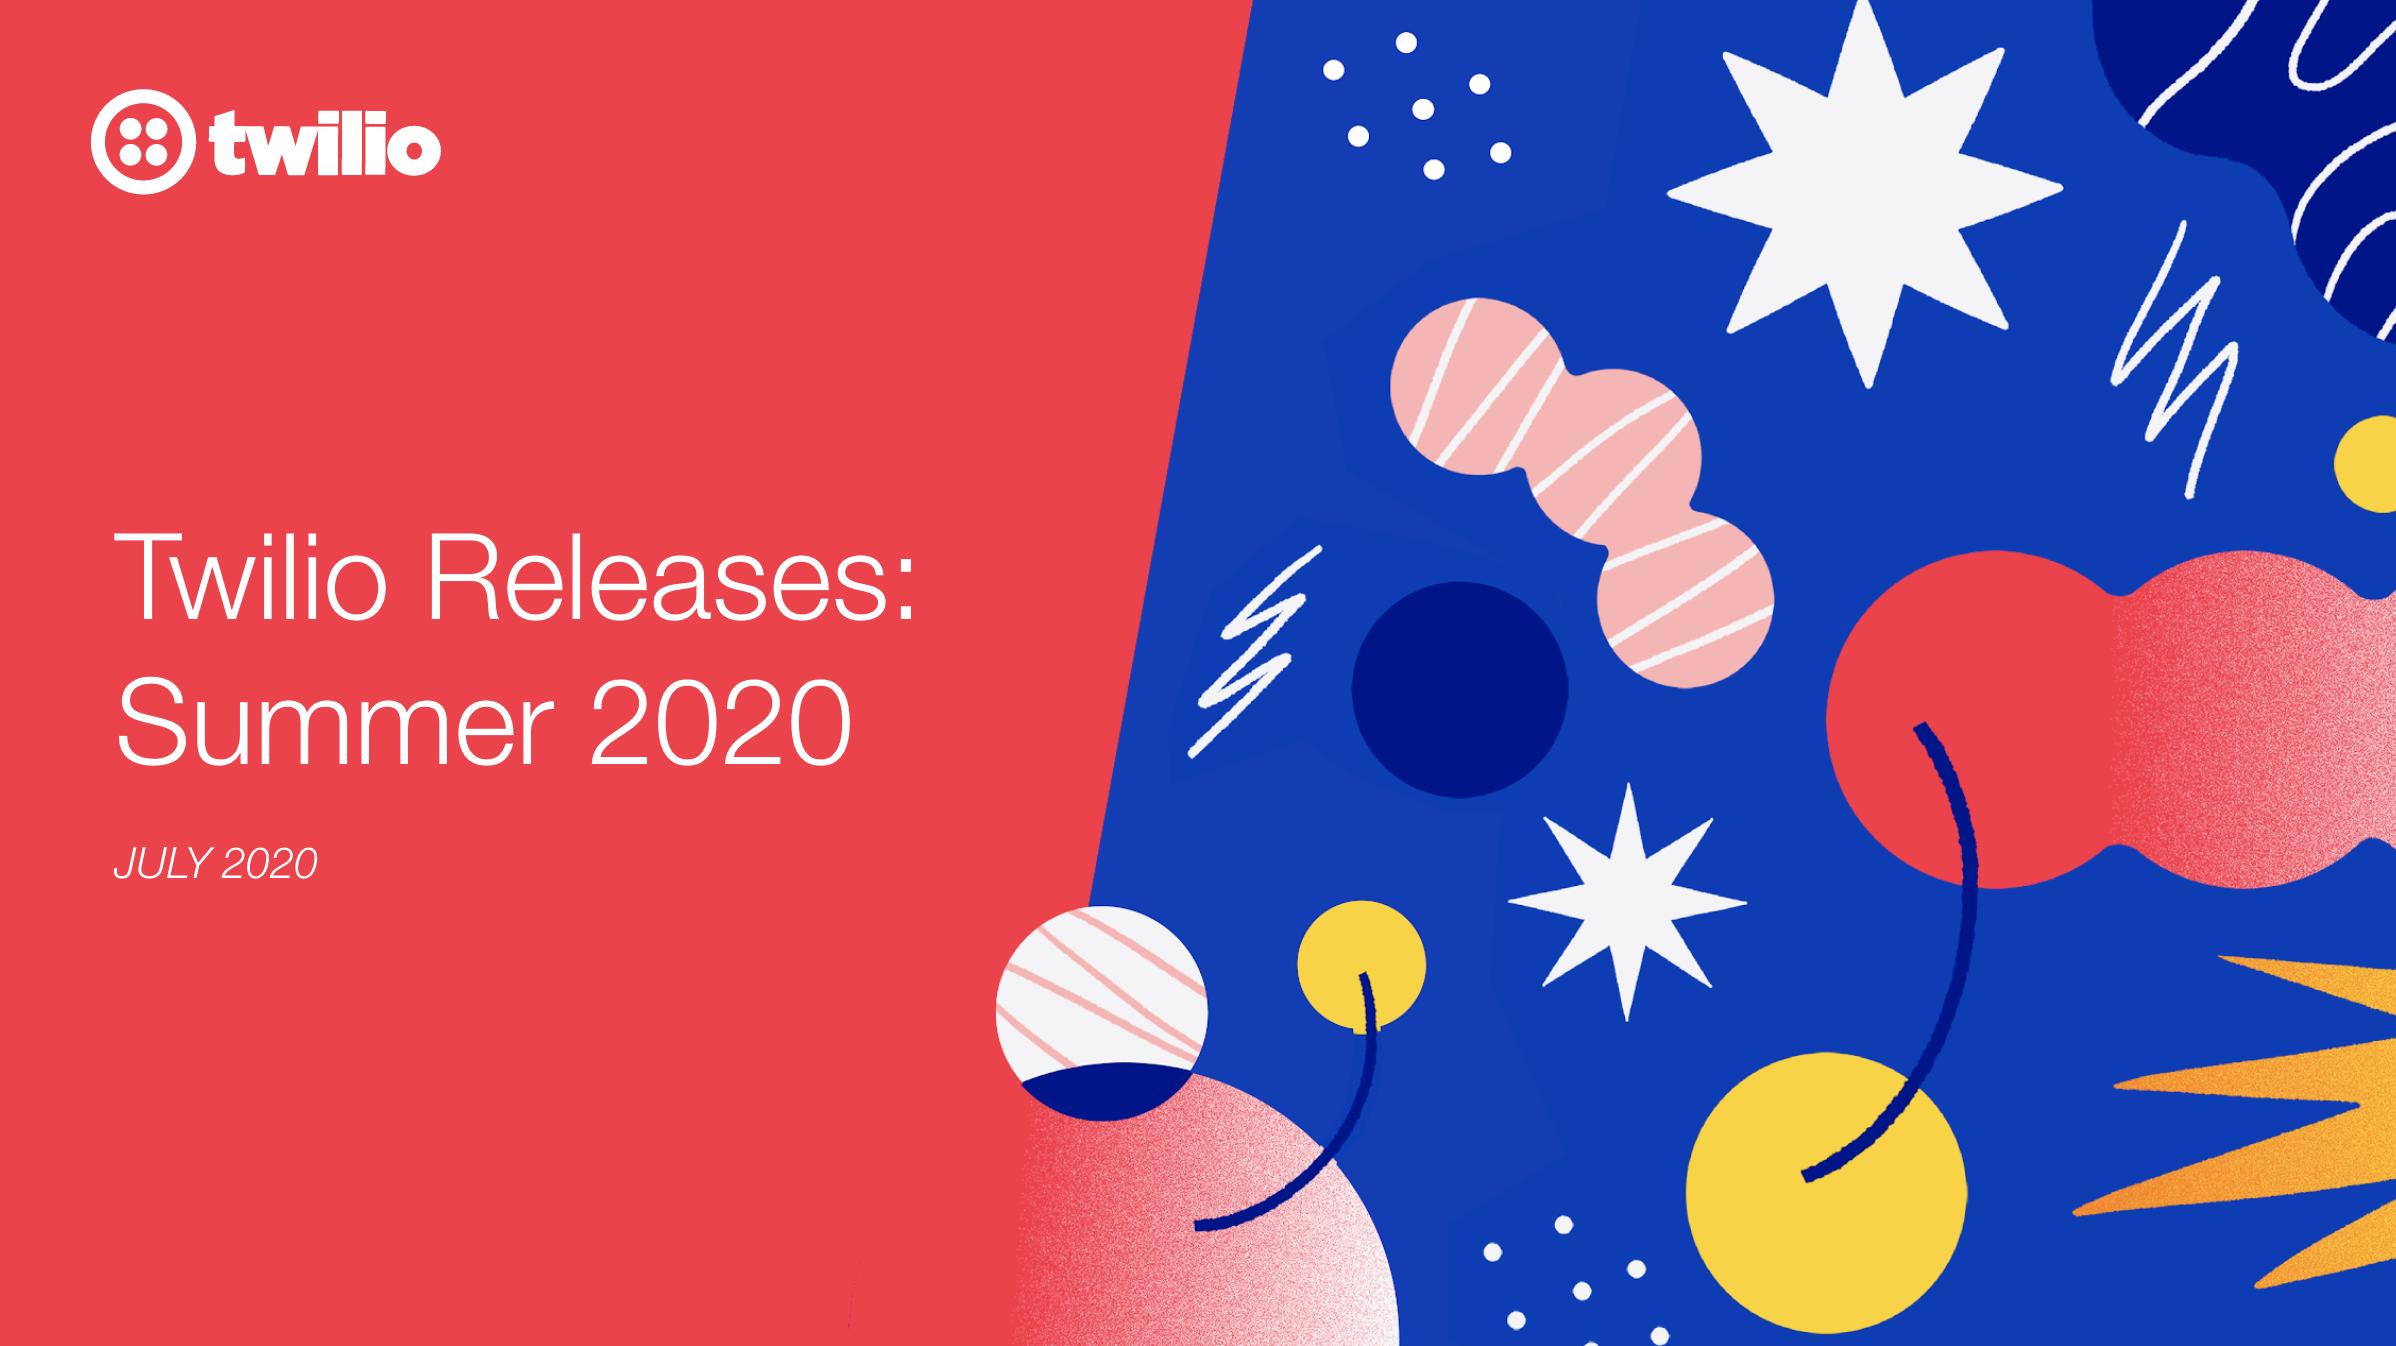 Twilio Release Webinar - Summer 2020 Splash